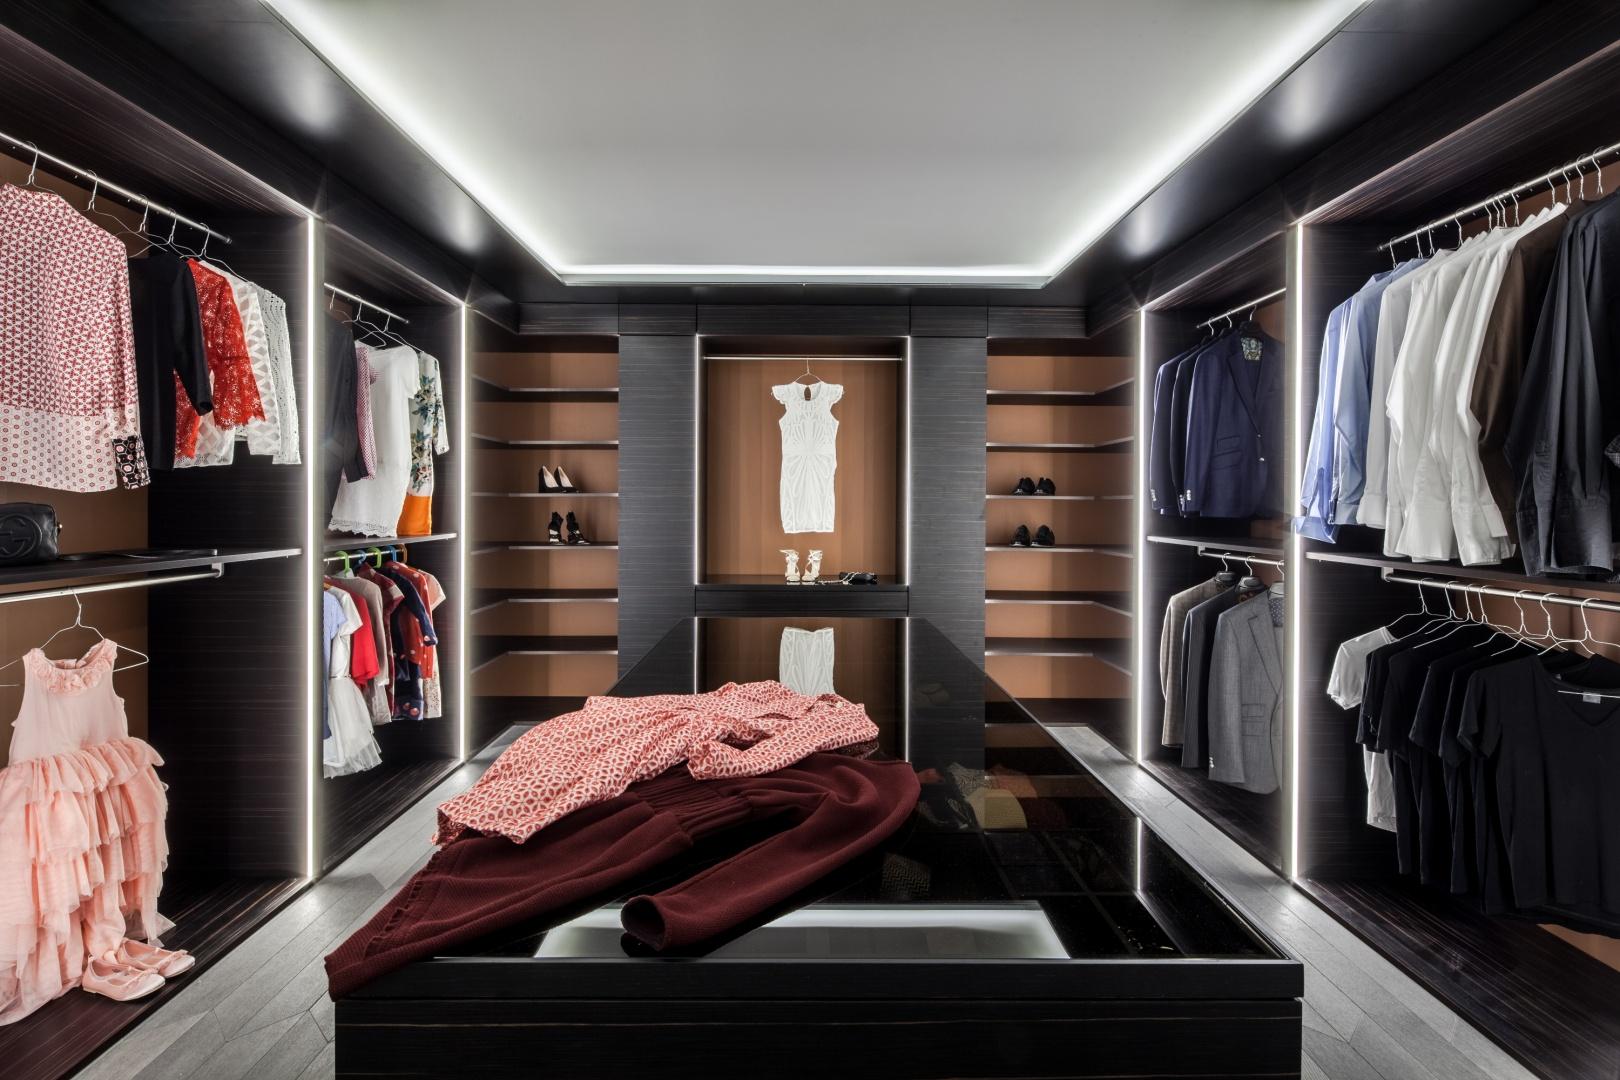 Garderobe © Mark Drotsky, Langenthal